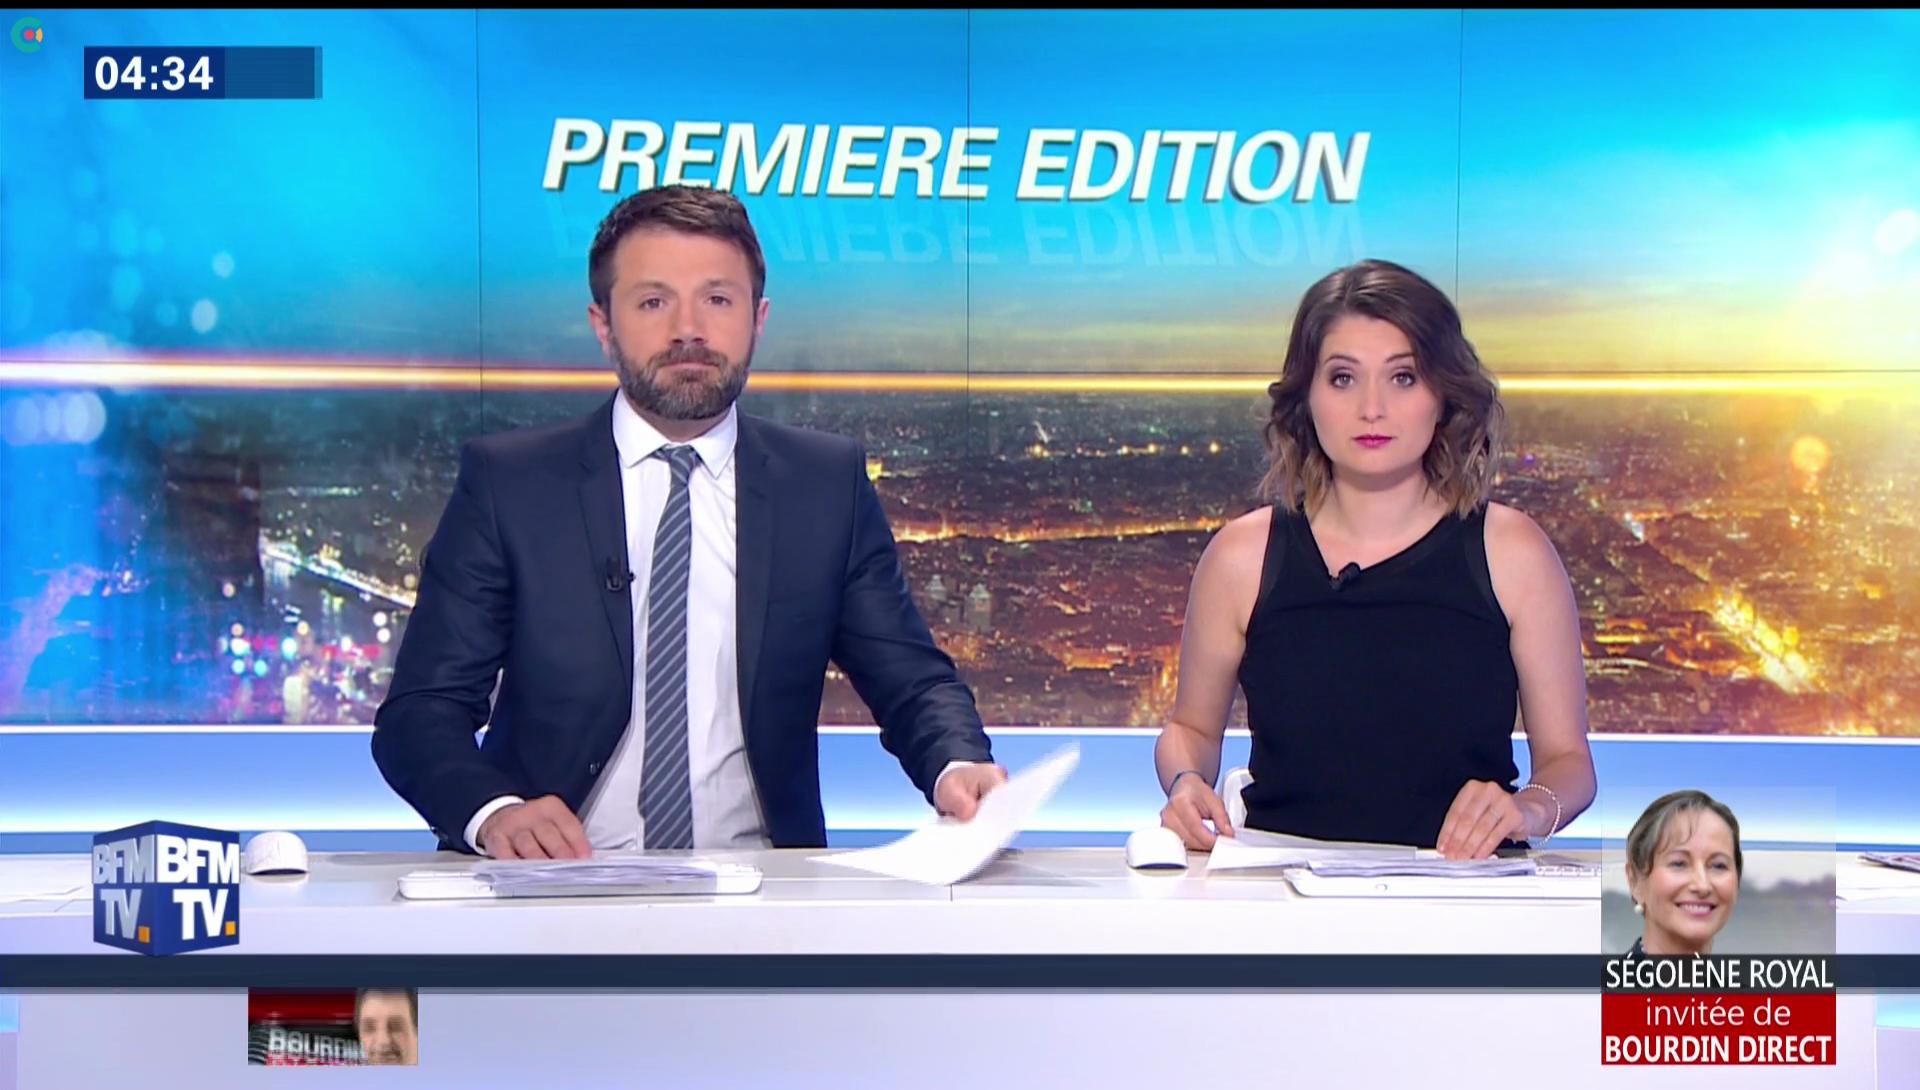 celinemoncel03.2017_06_13_premiereeditionBFMTV